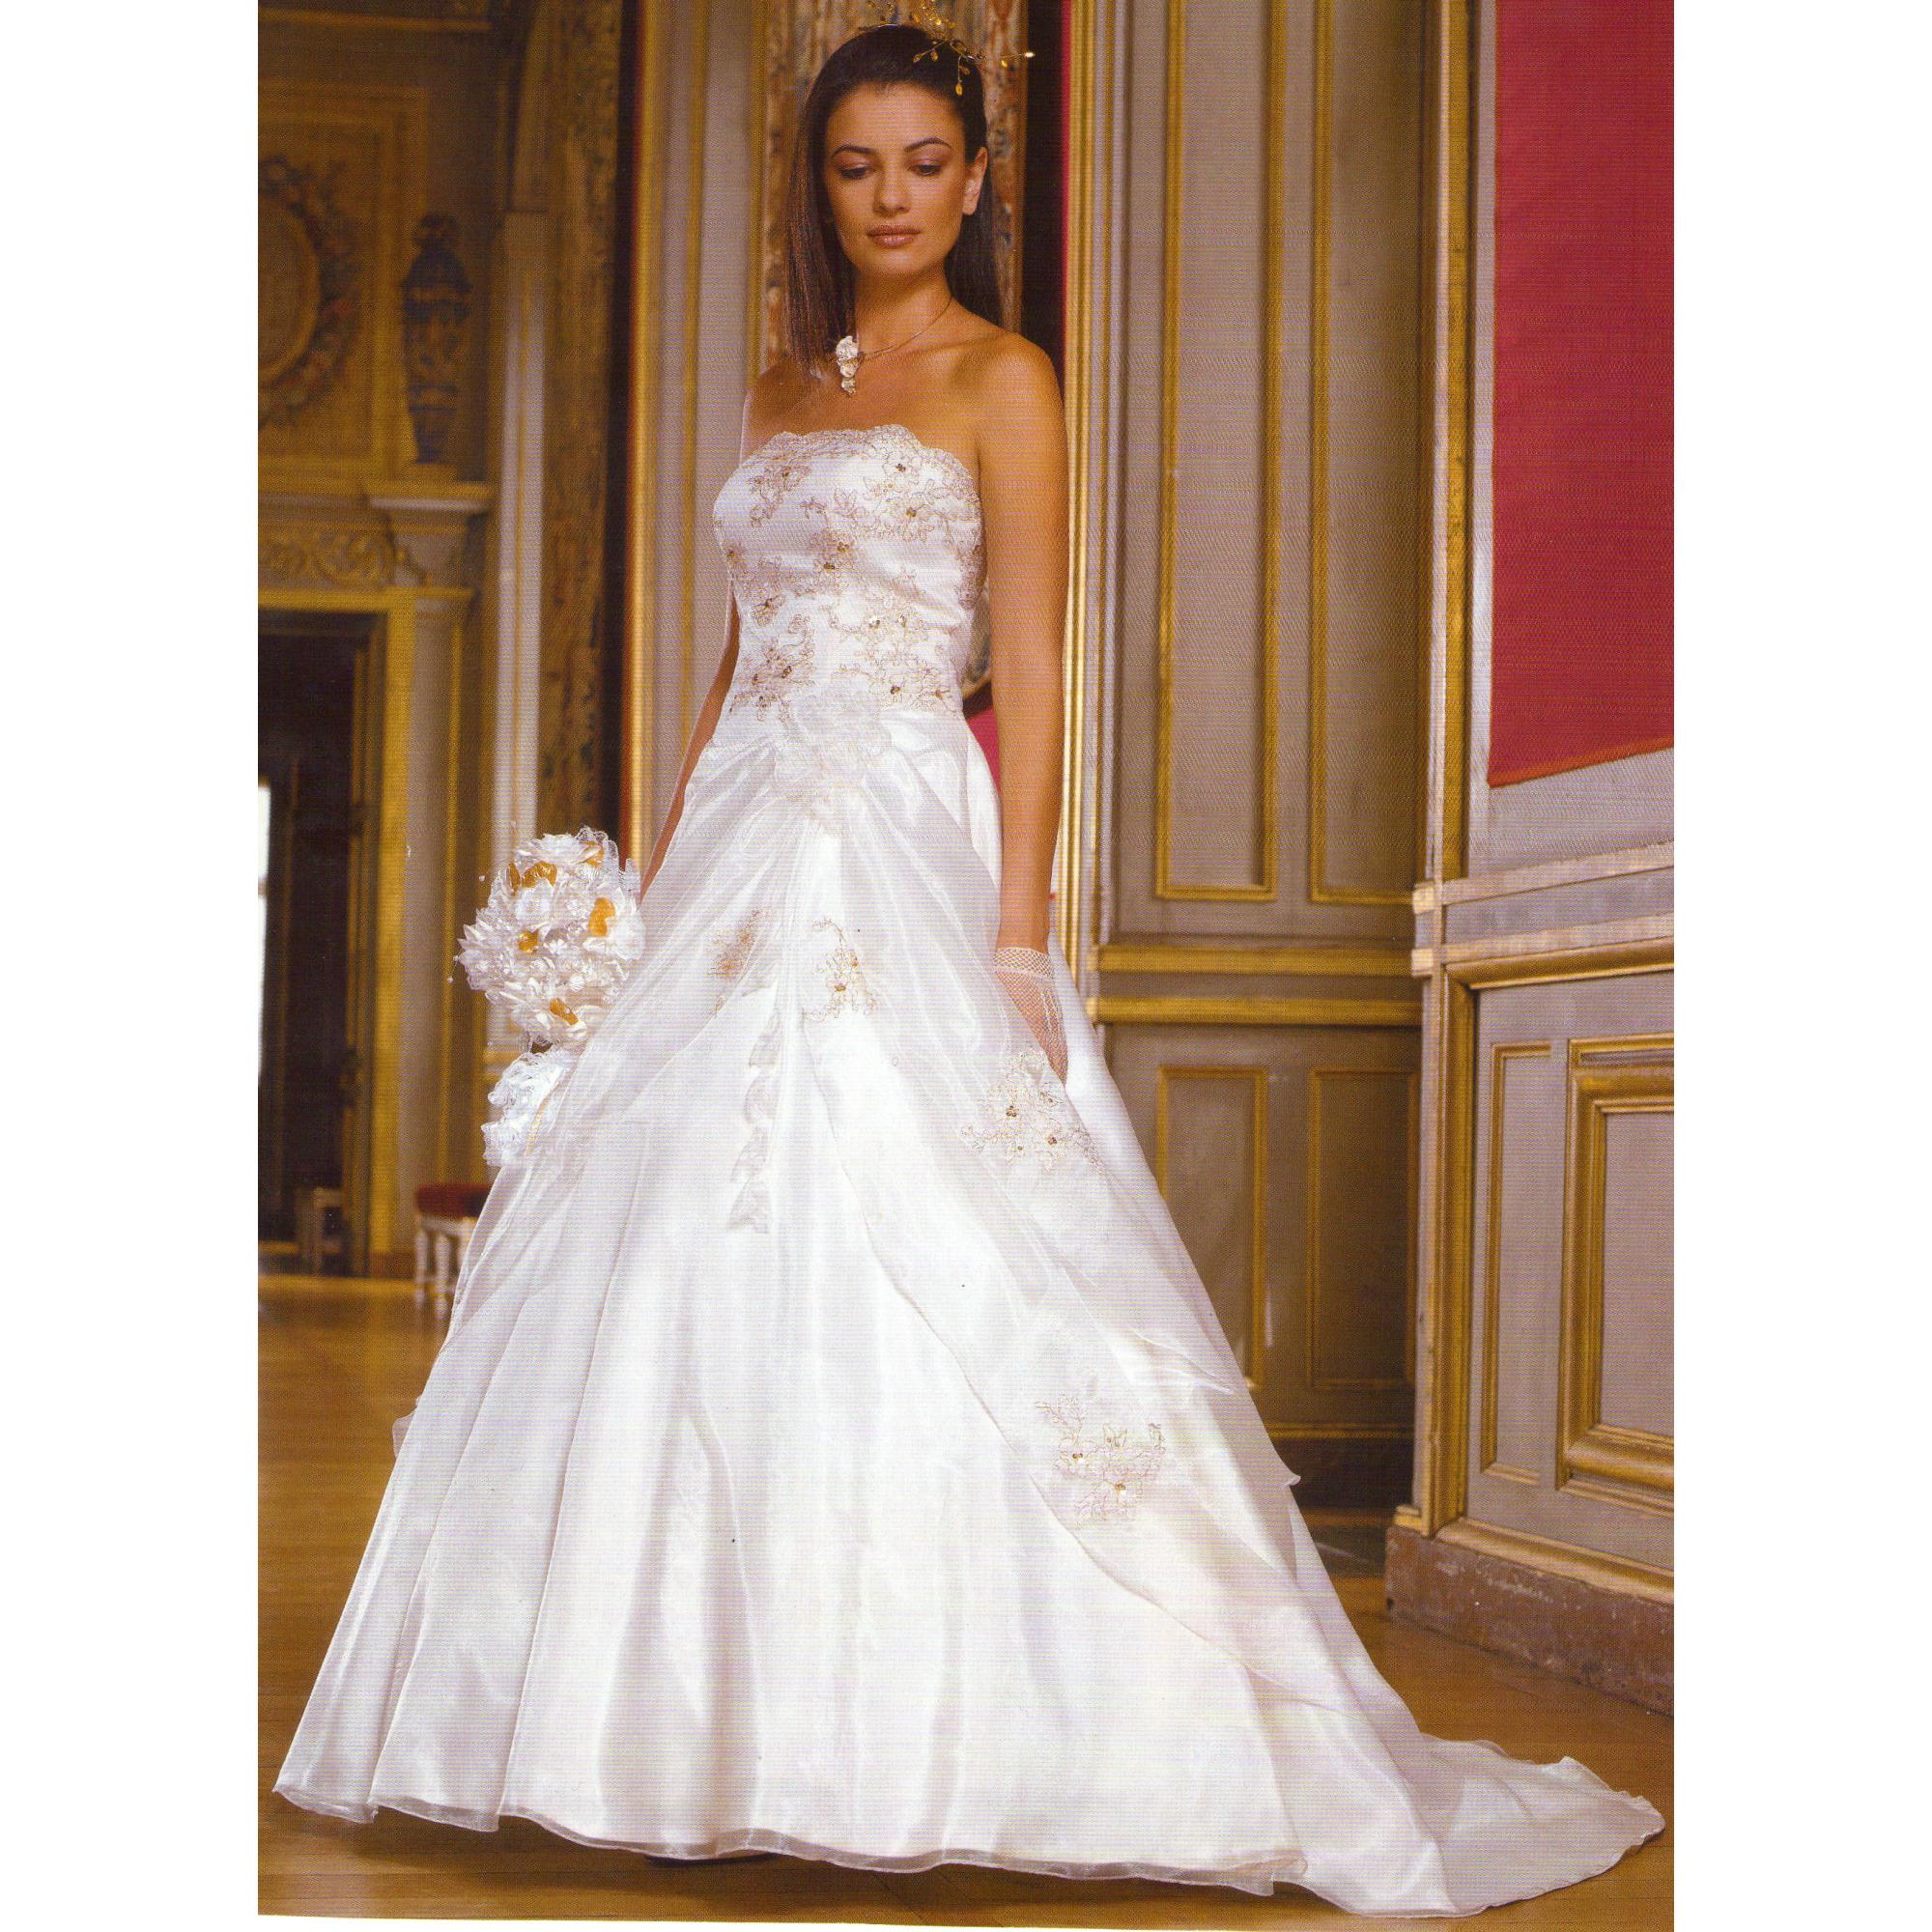 e0f992fa525 Robe de mariée TATI Autre blanc - 2274608